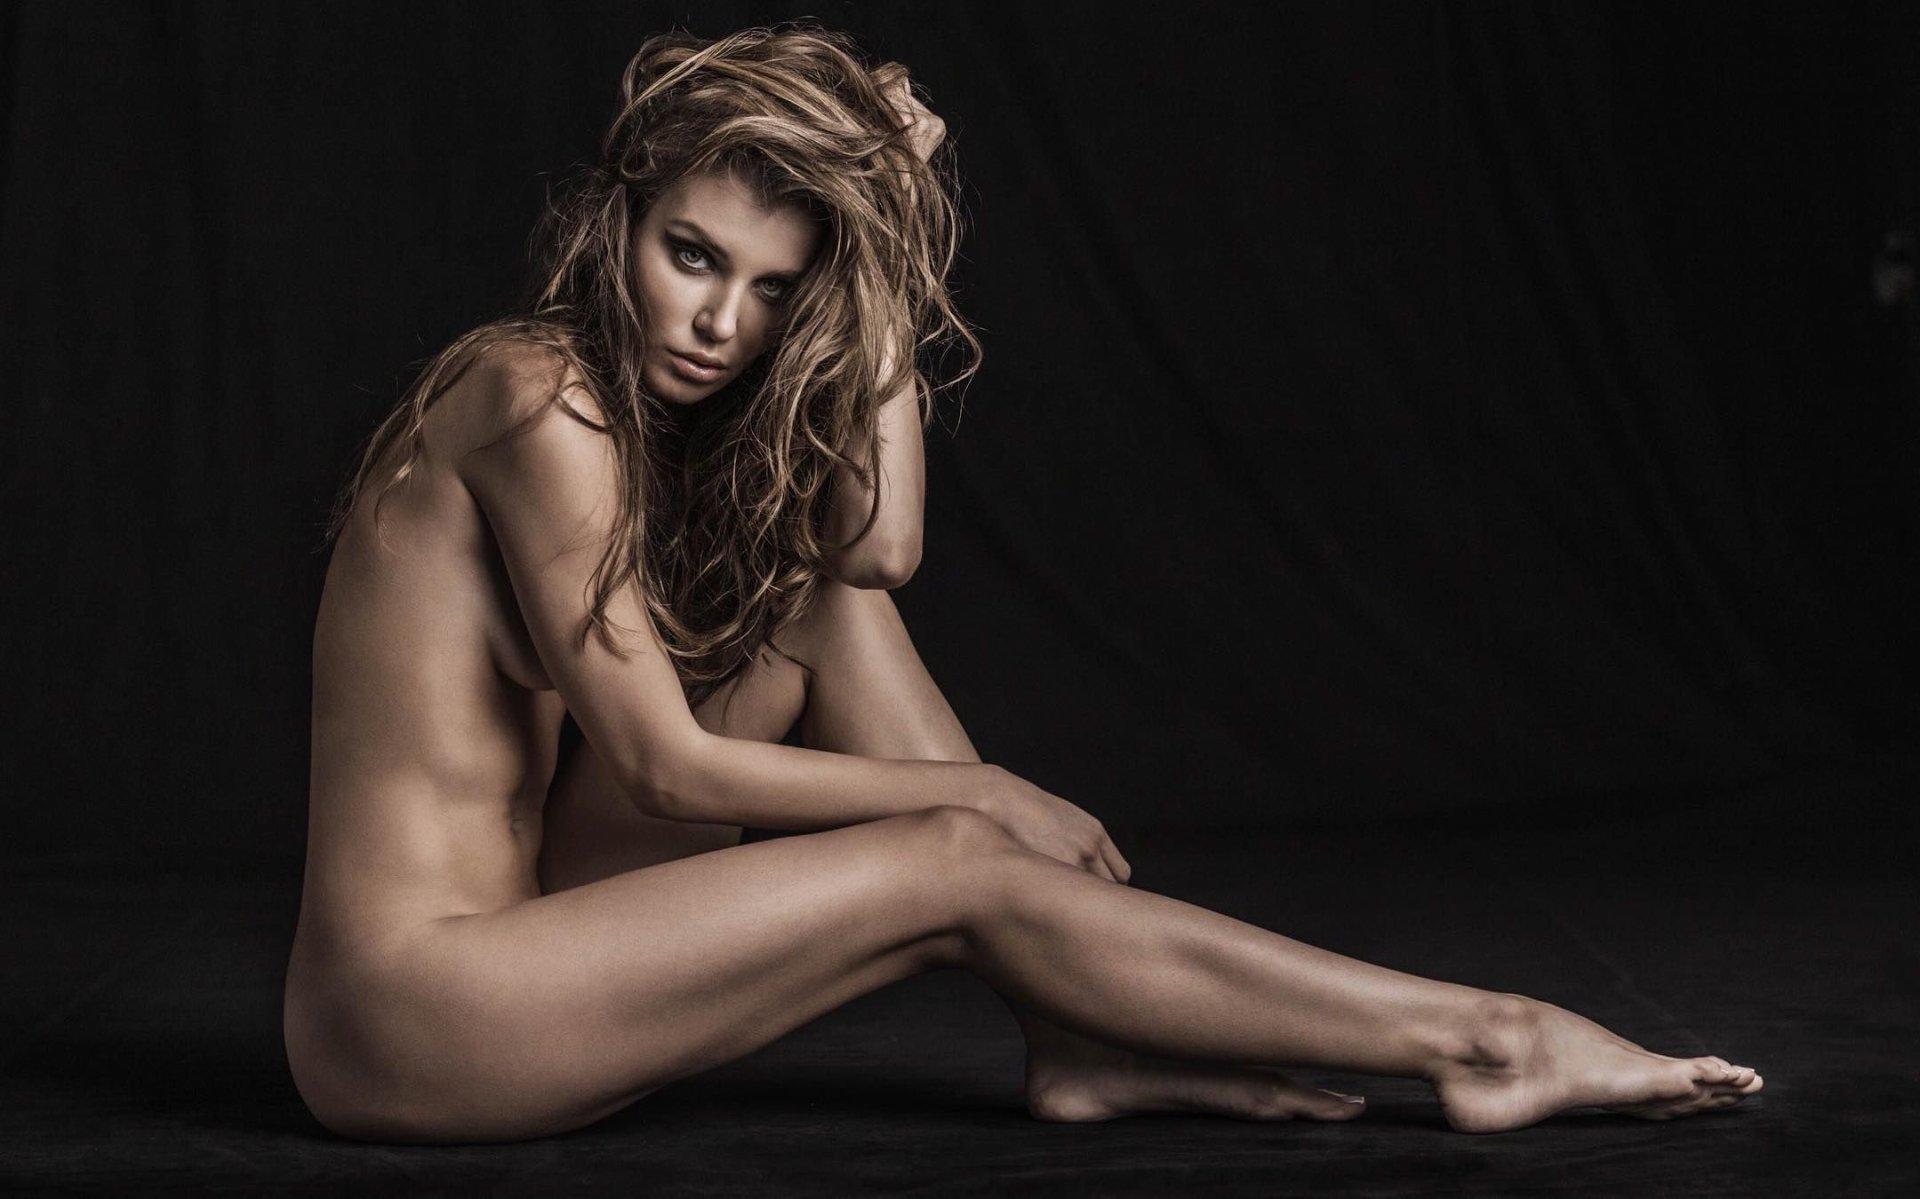 Evan Rachel Wood Nude Photos The Complete Collection - 49 PICS pics